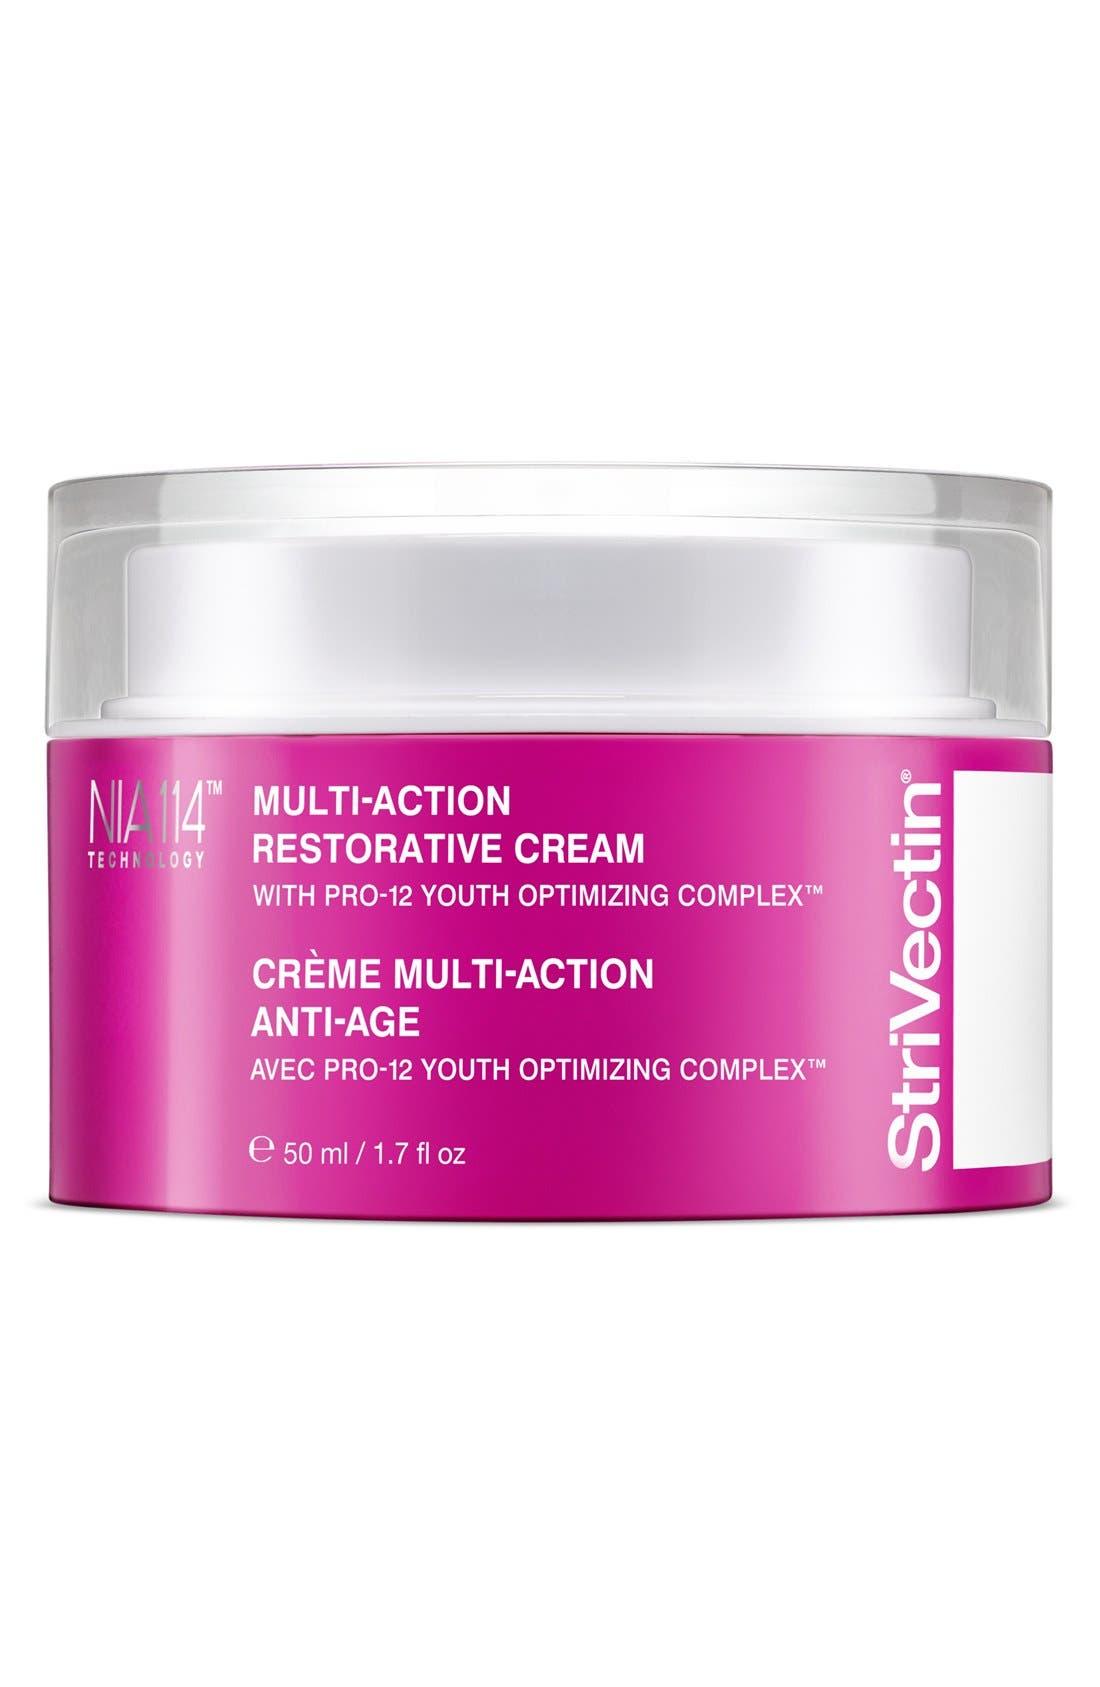 StriVectin® Multi-Action Restorative Cream